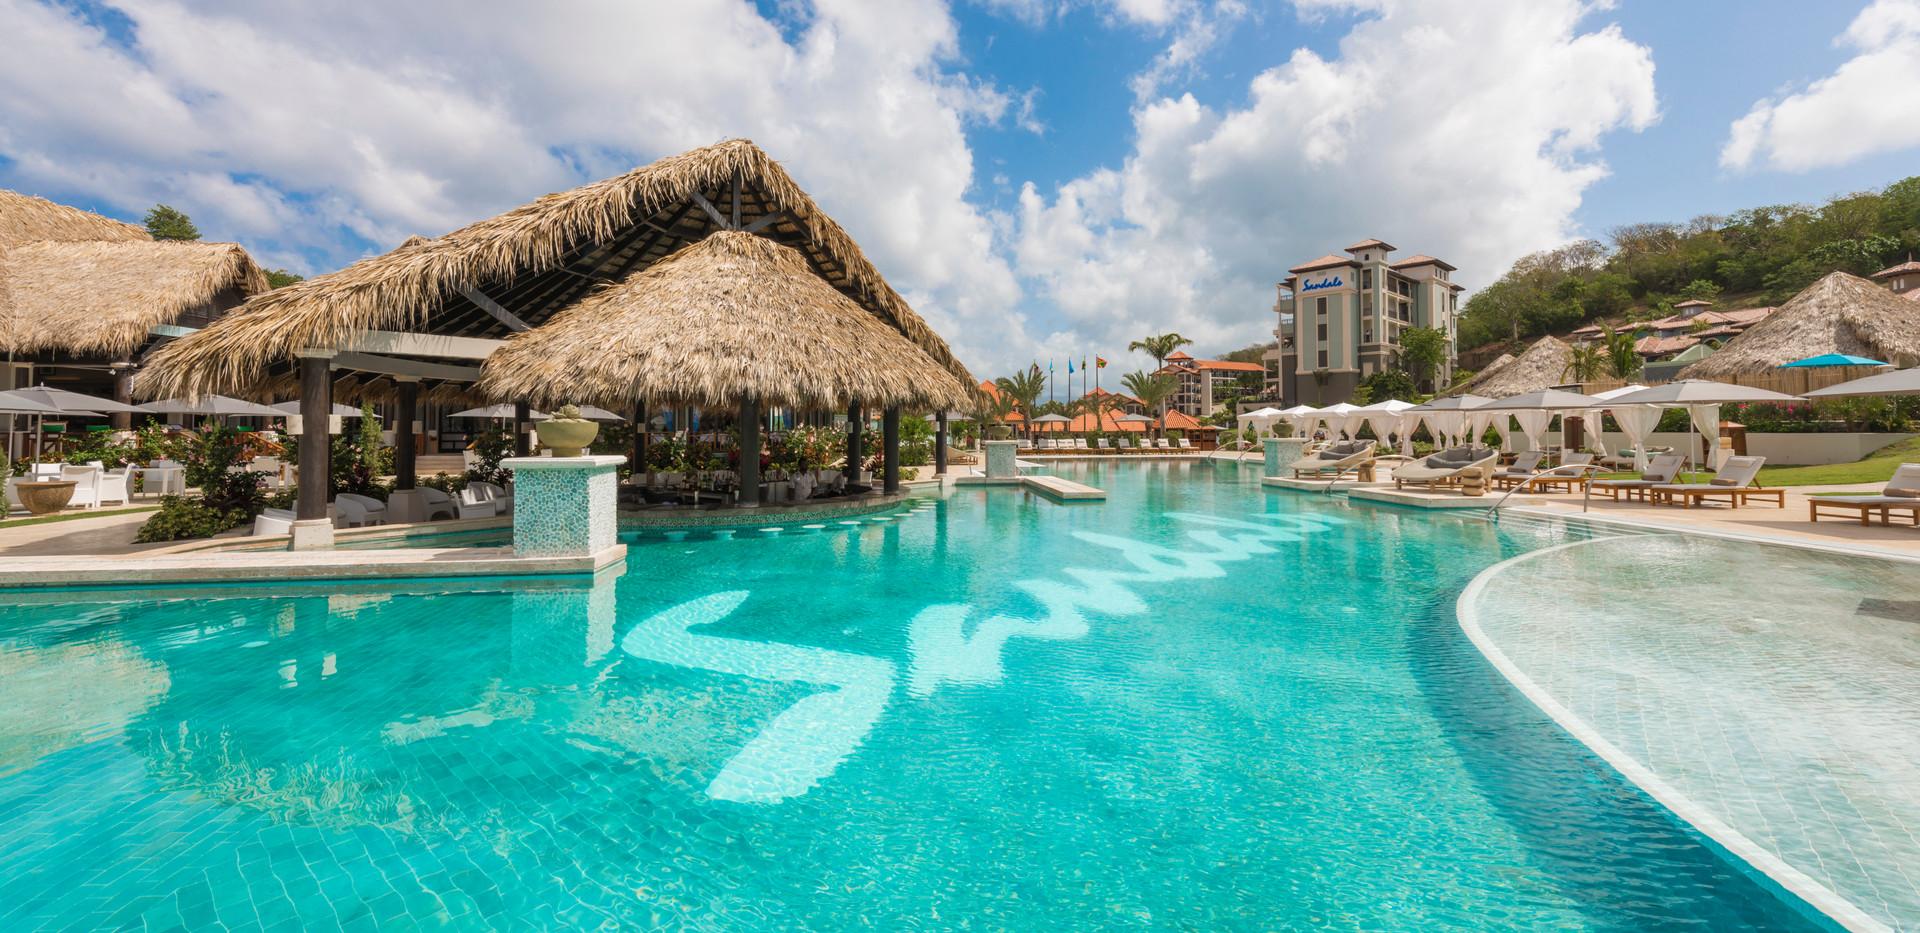 Grenada Pool 10.jpeg